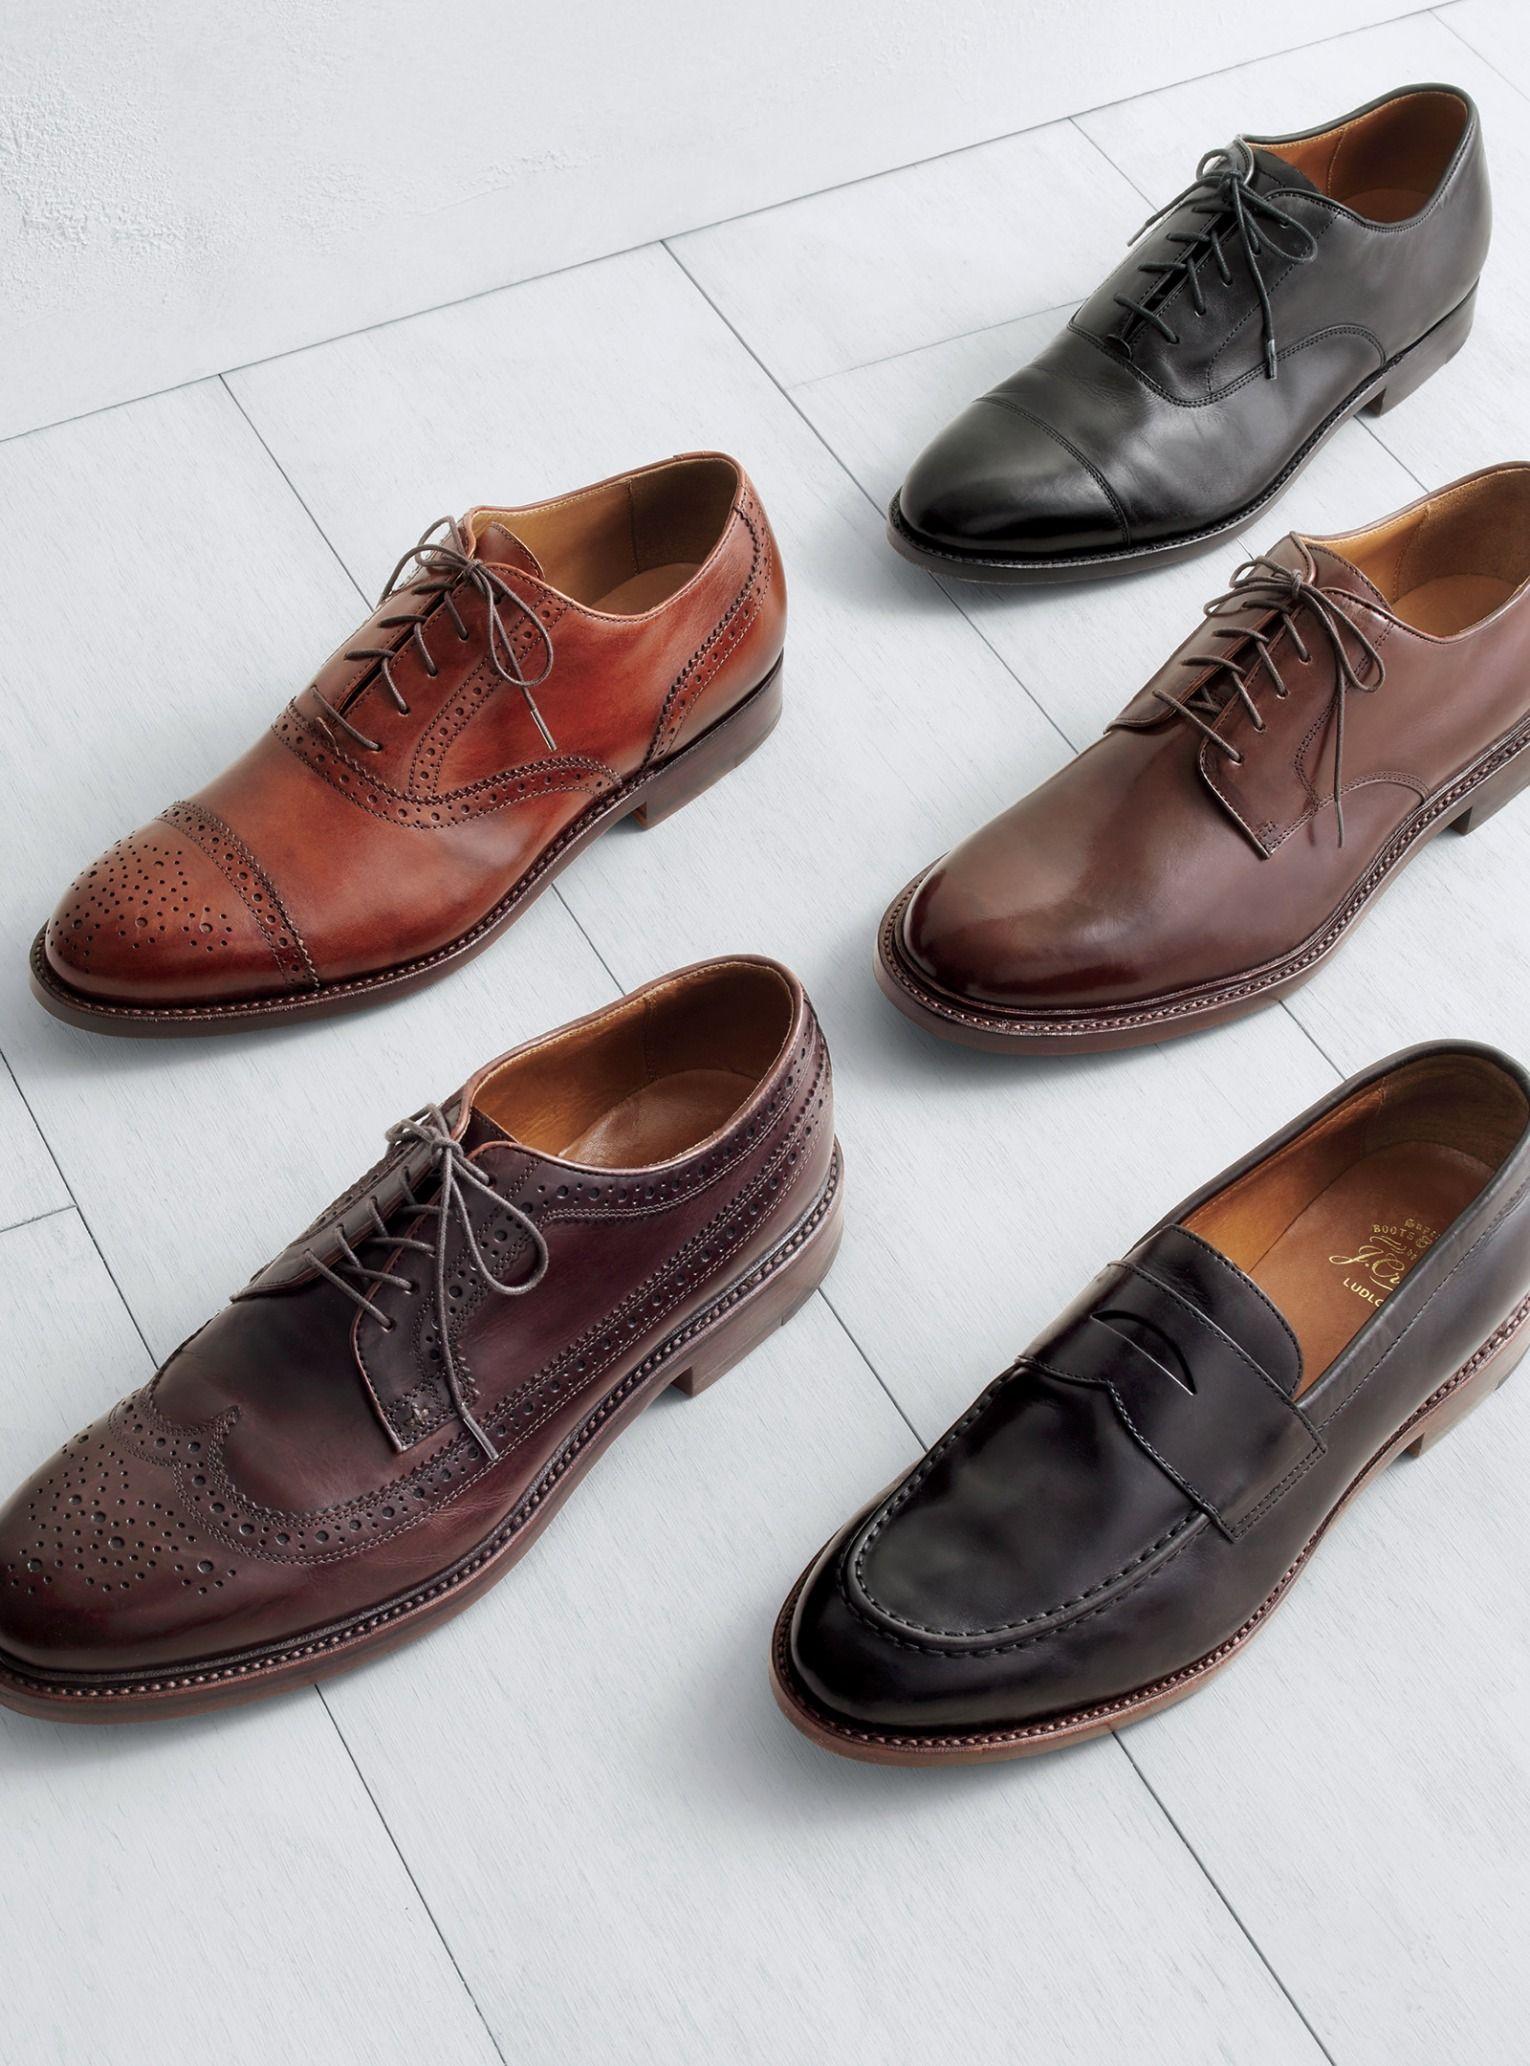 ba46a0aa50e J.Crew men s Ludlow shoes. To pre-order